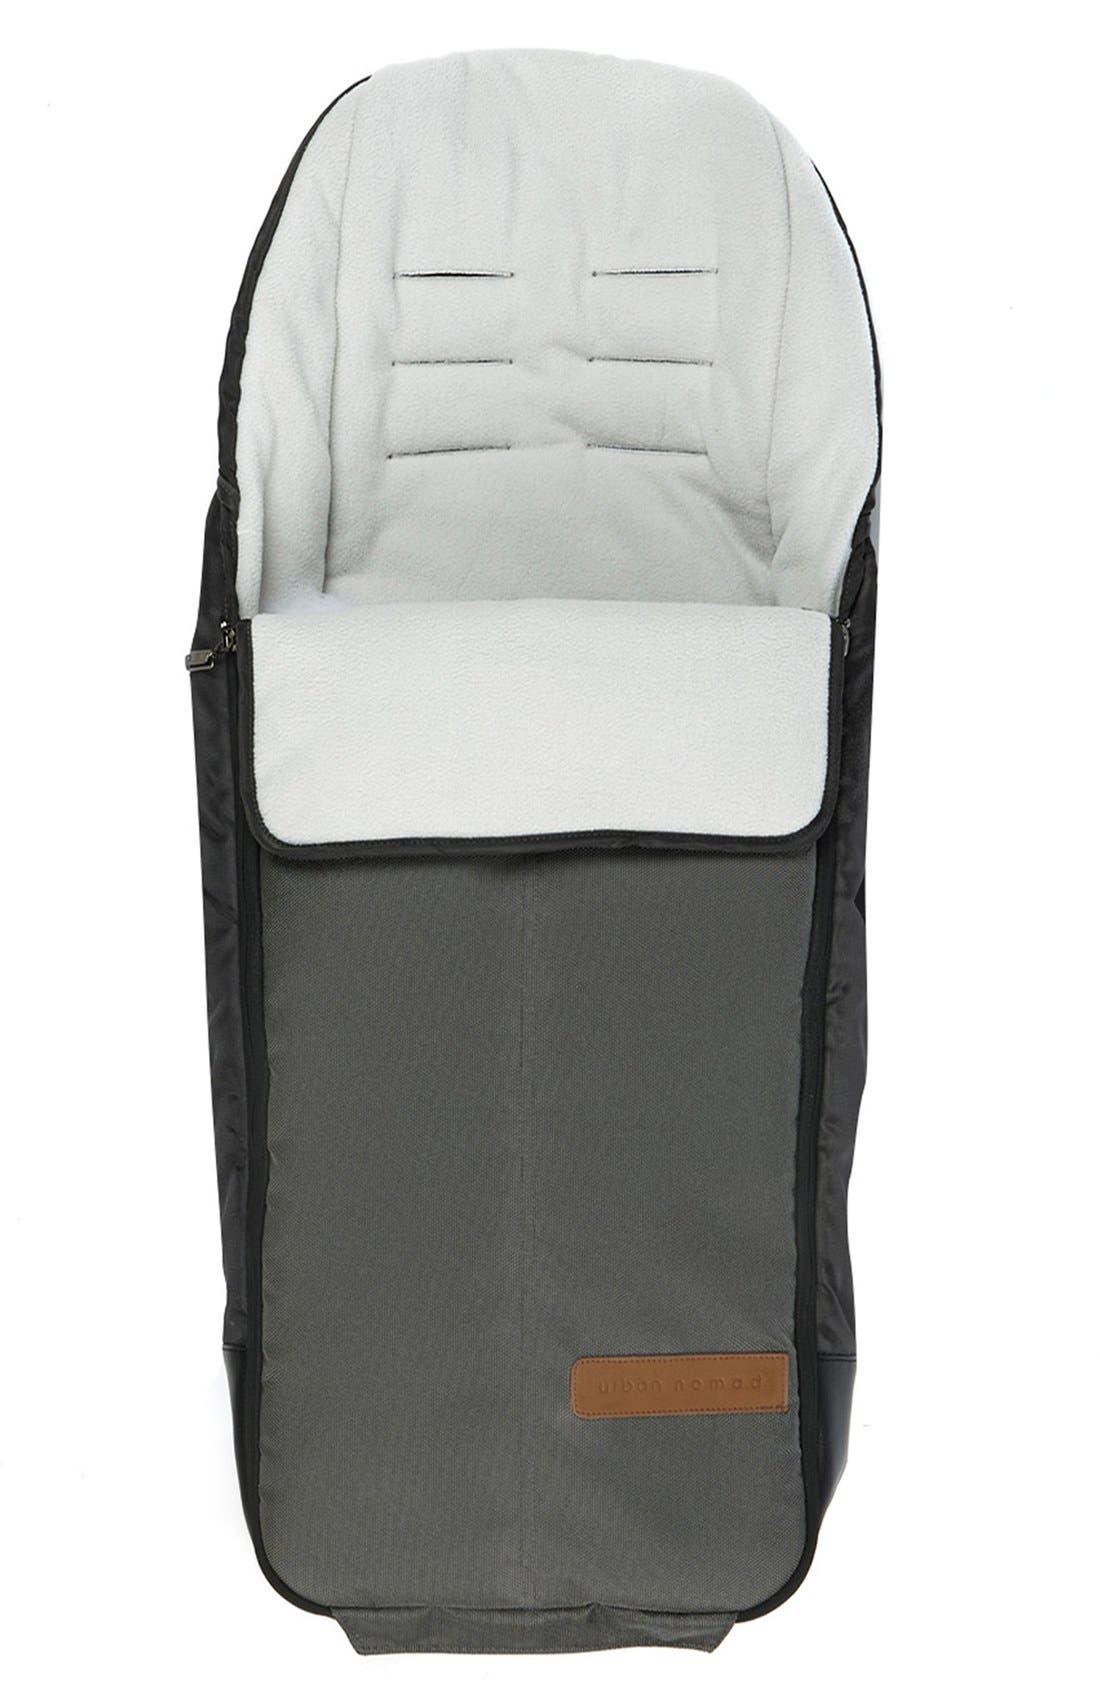 'Igo - Urban Nomad' Water Resistant Footmuff,                         Main,                         color, 020